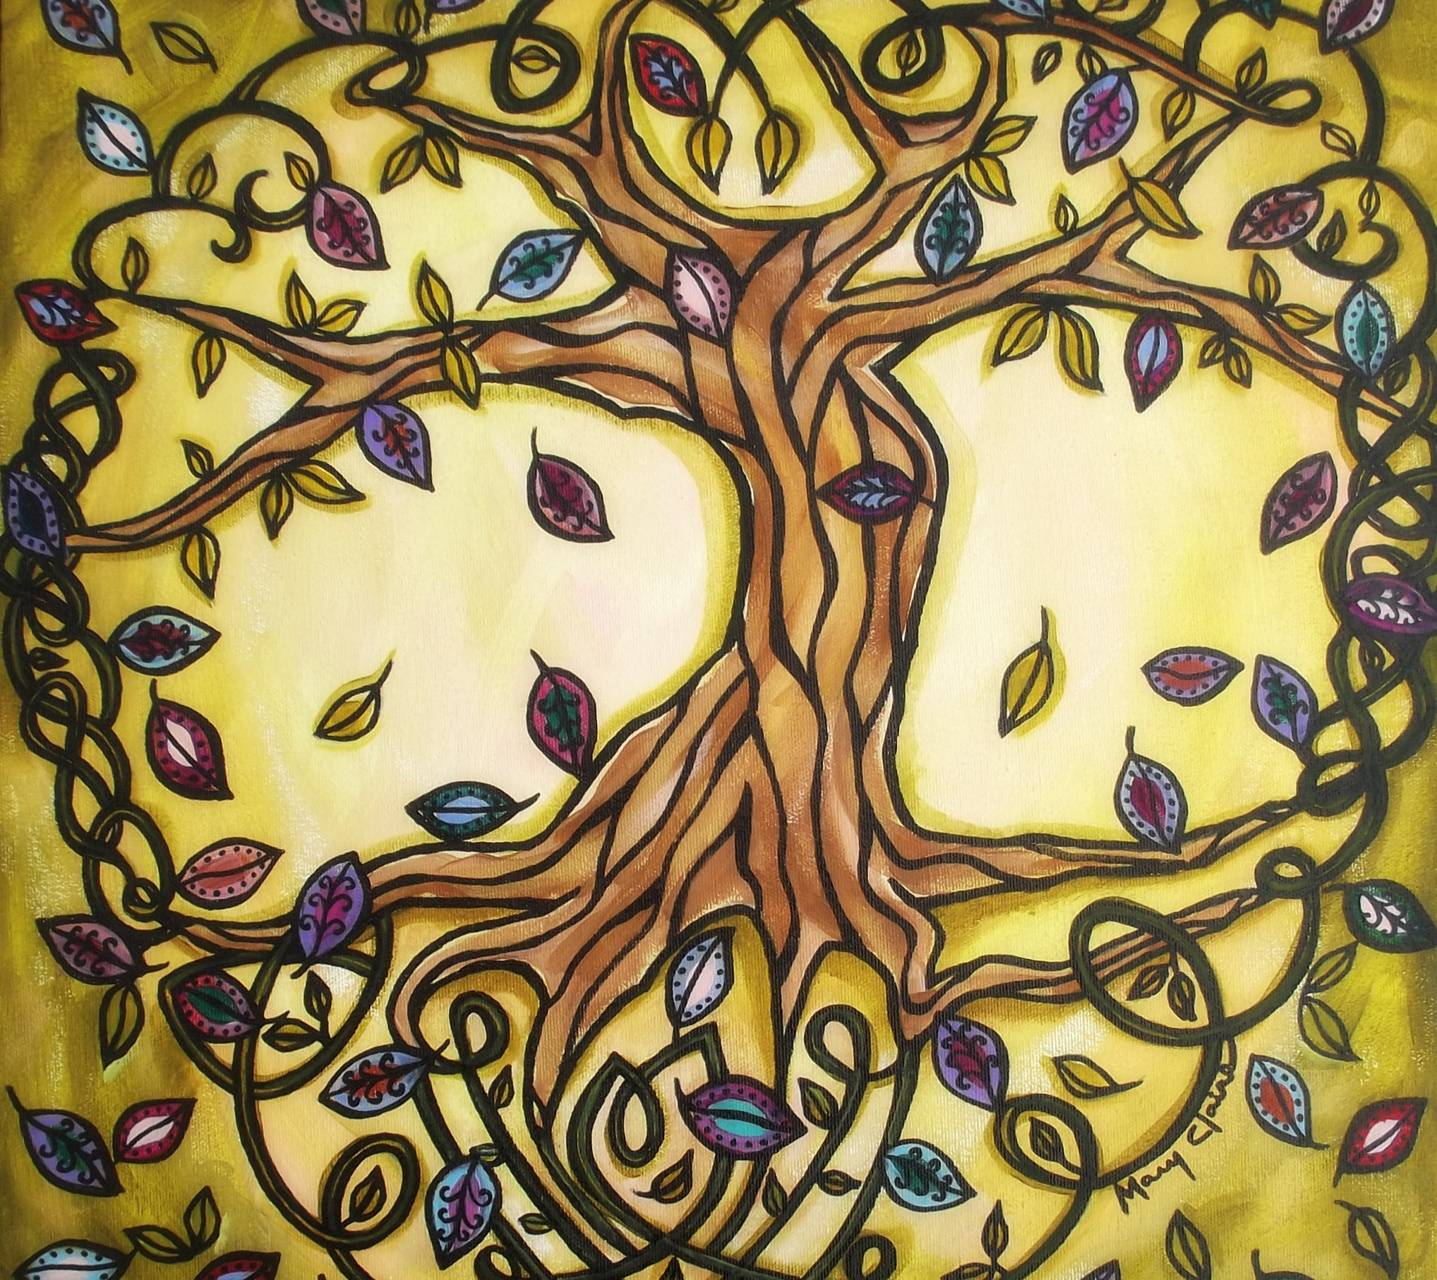 Celtic Tree Of Life Wallpaper By Deadgirl75 46 Free On Zedge